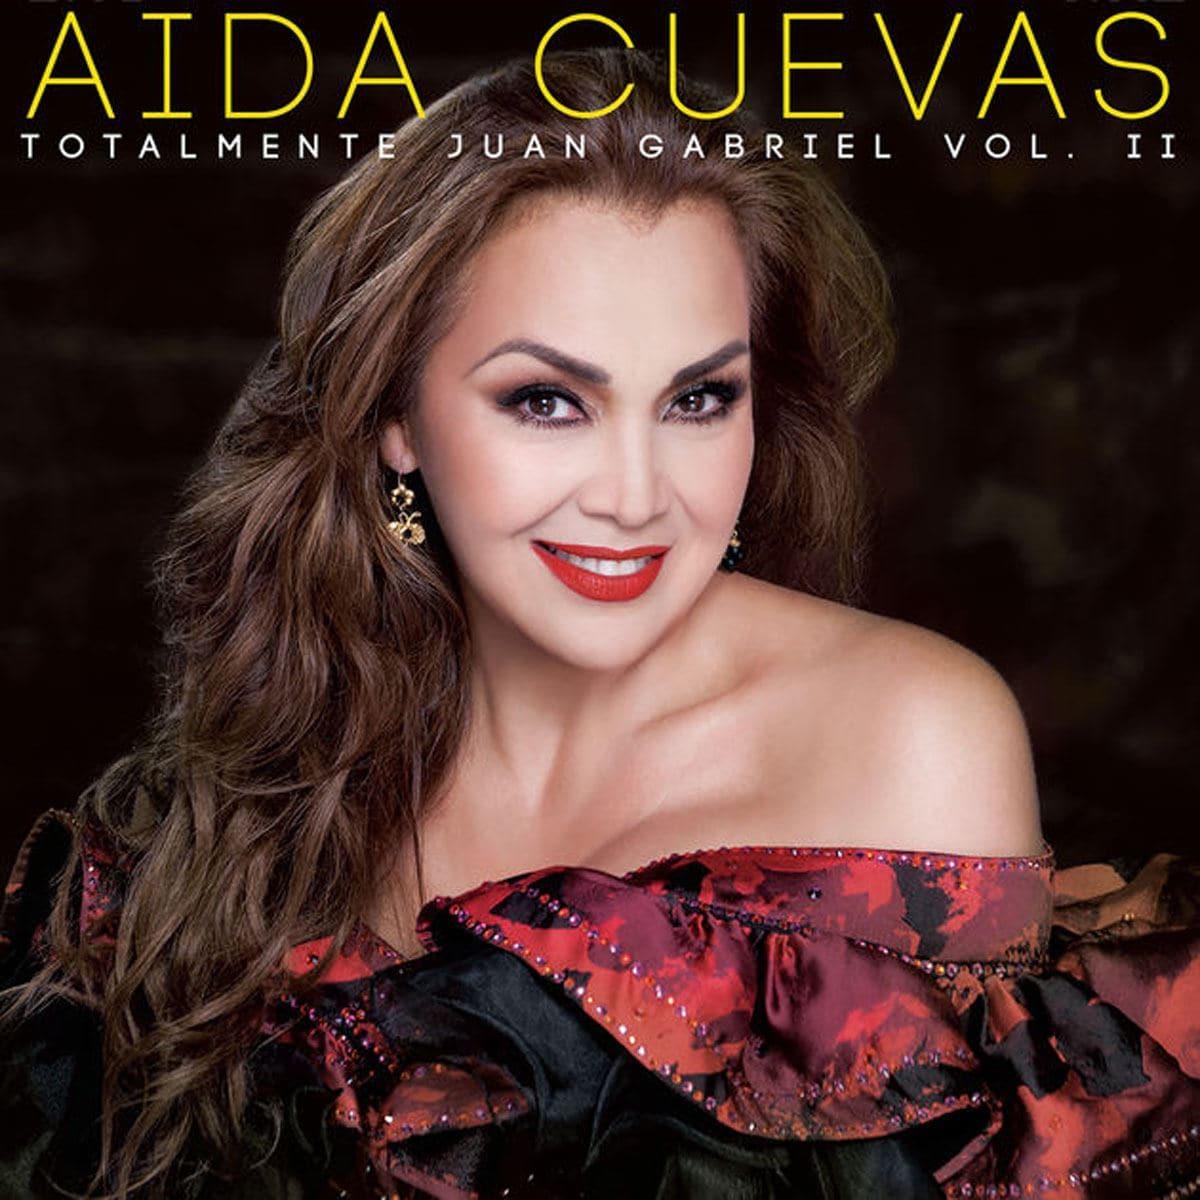 CD Aida Cuevas-Totalmente Juan Gabriel Vol. 2